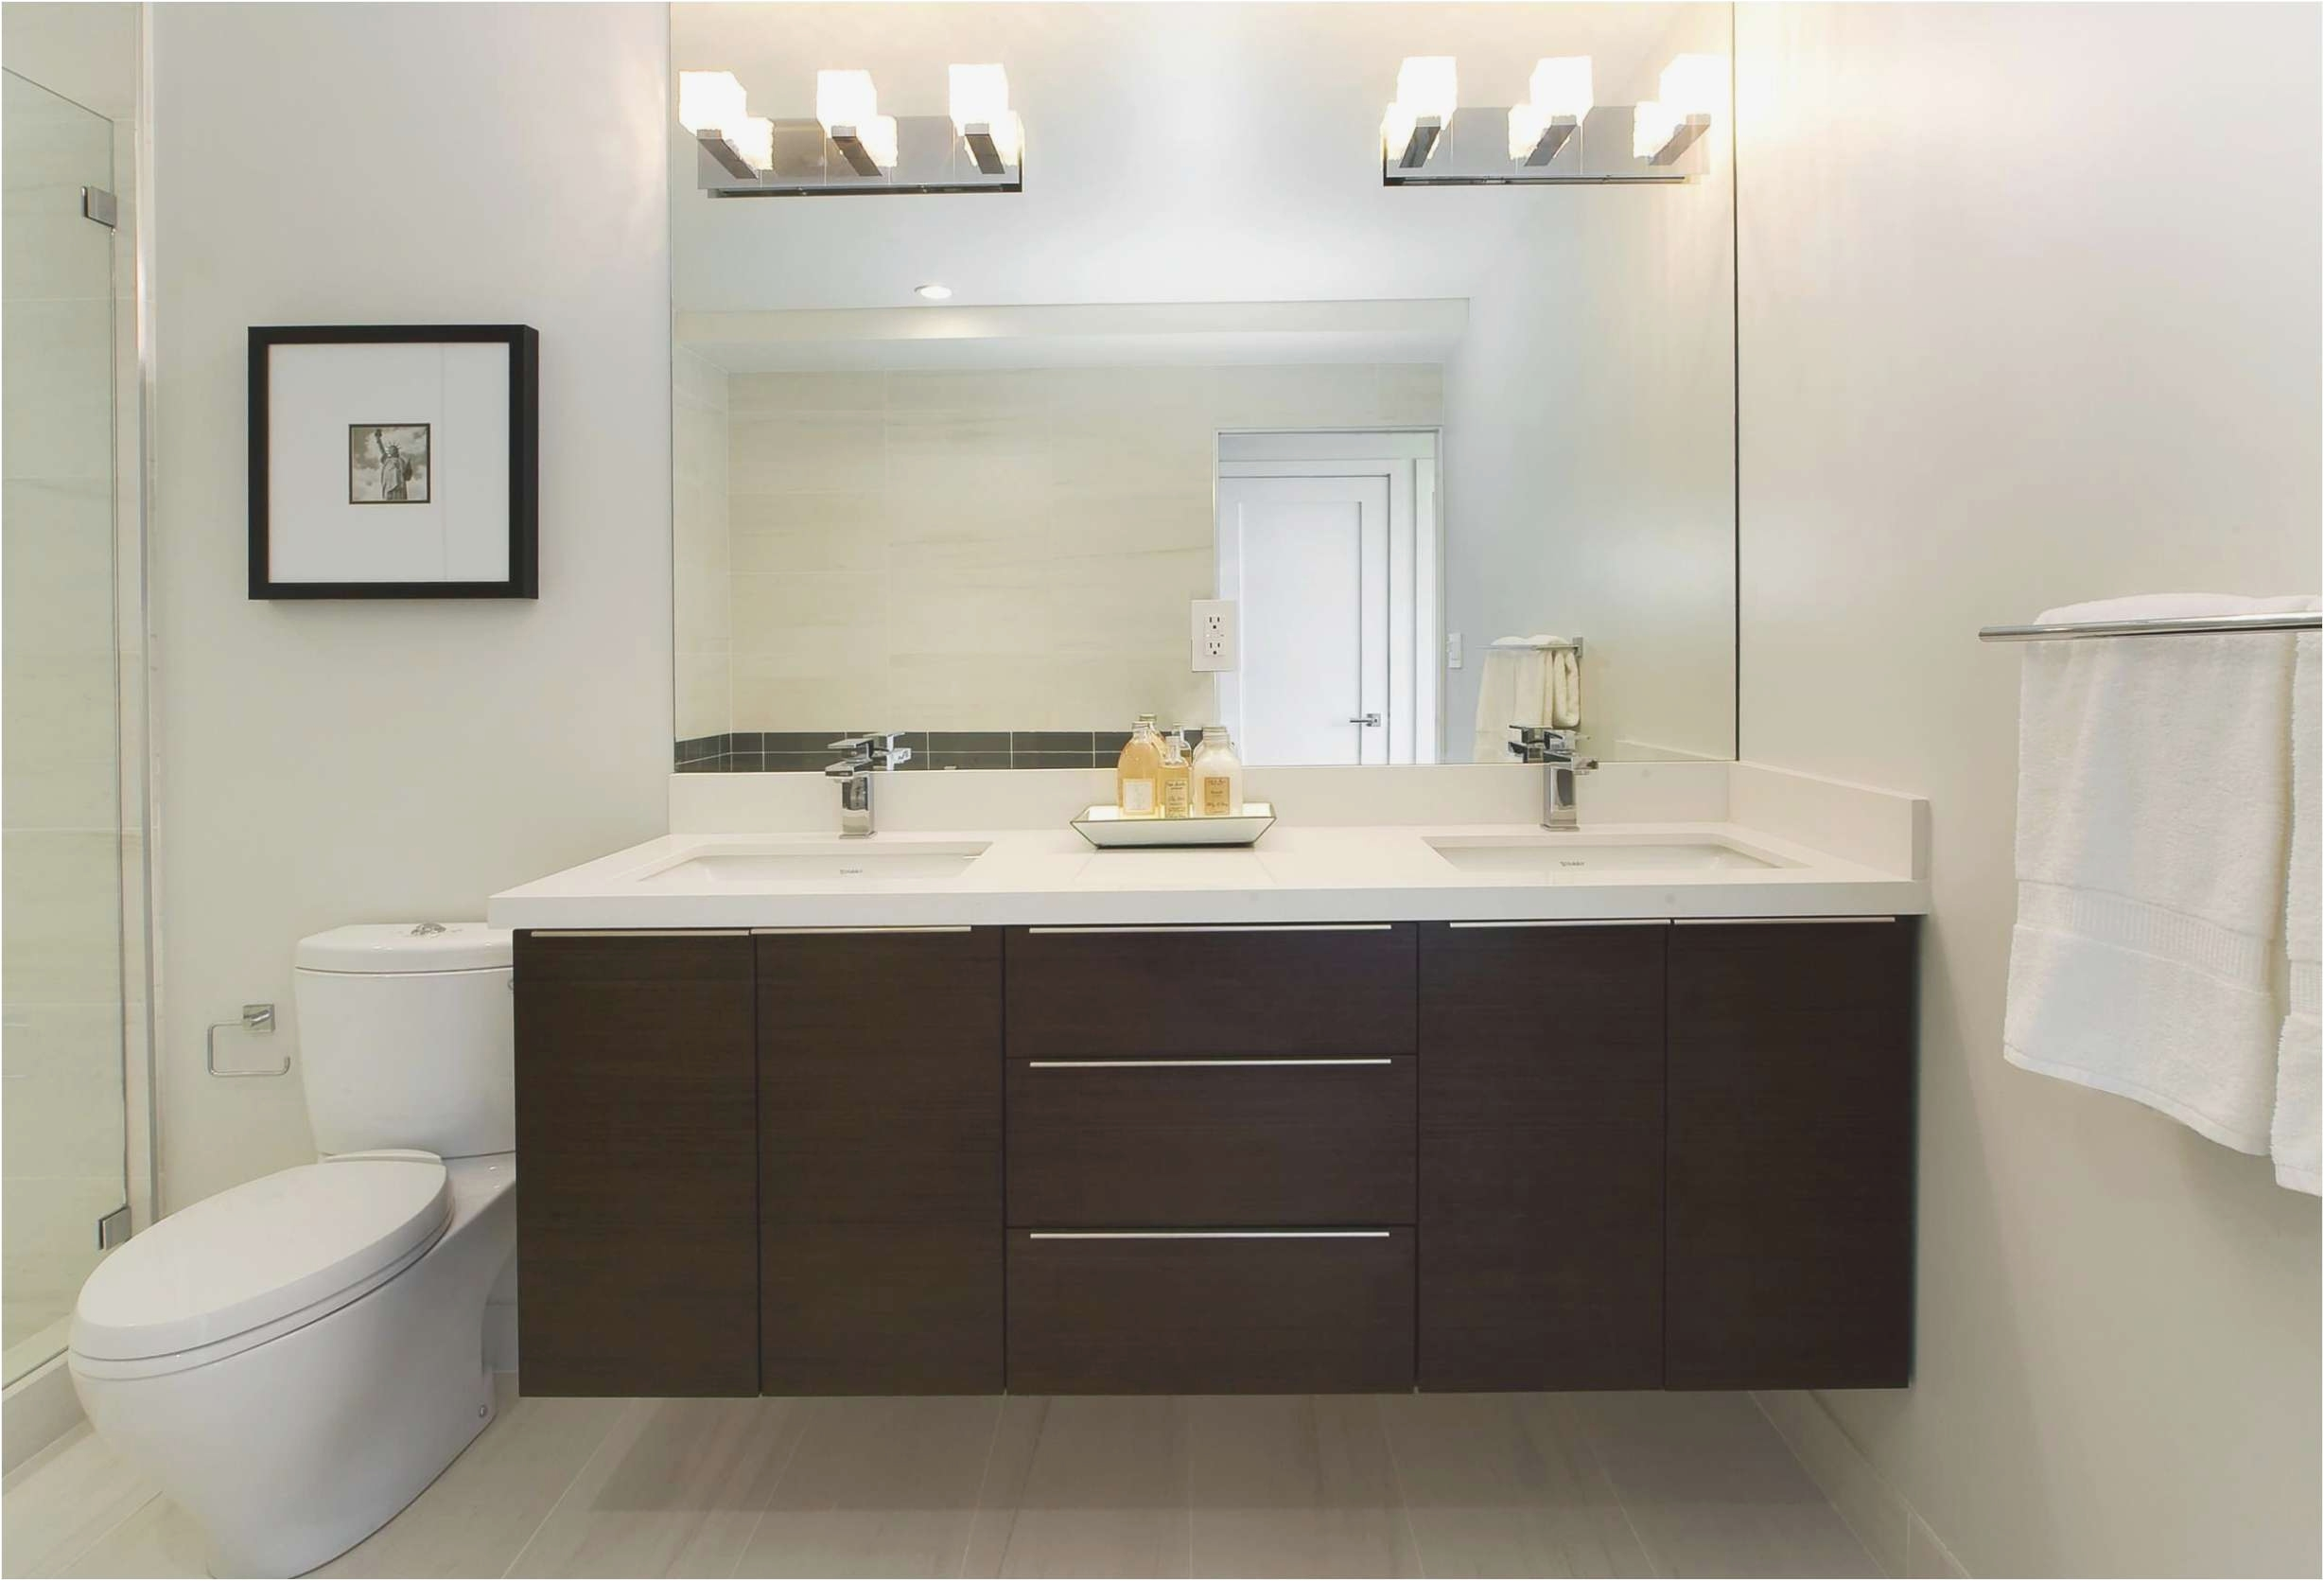 Custom Bathroom Vanity Cabinets Awesome H Sink New Bathroom I 0d Inspiring Installing Install